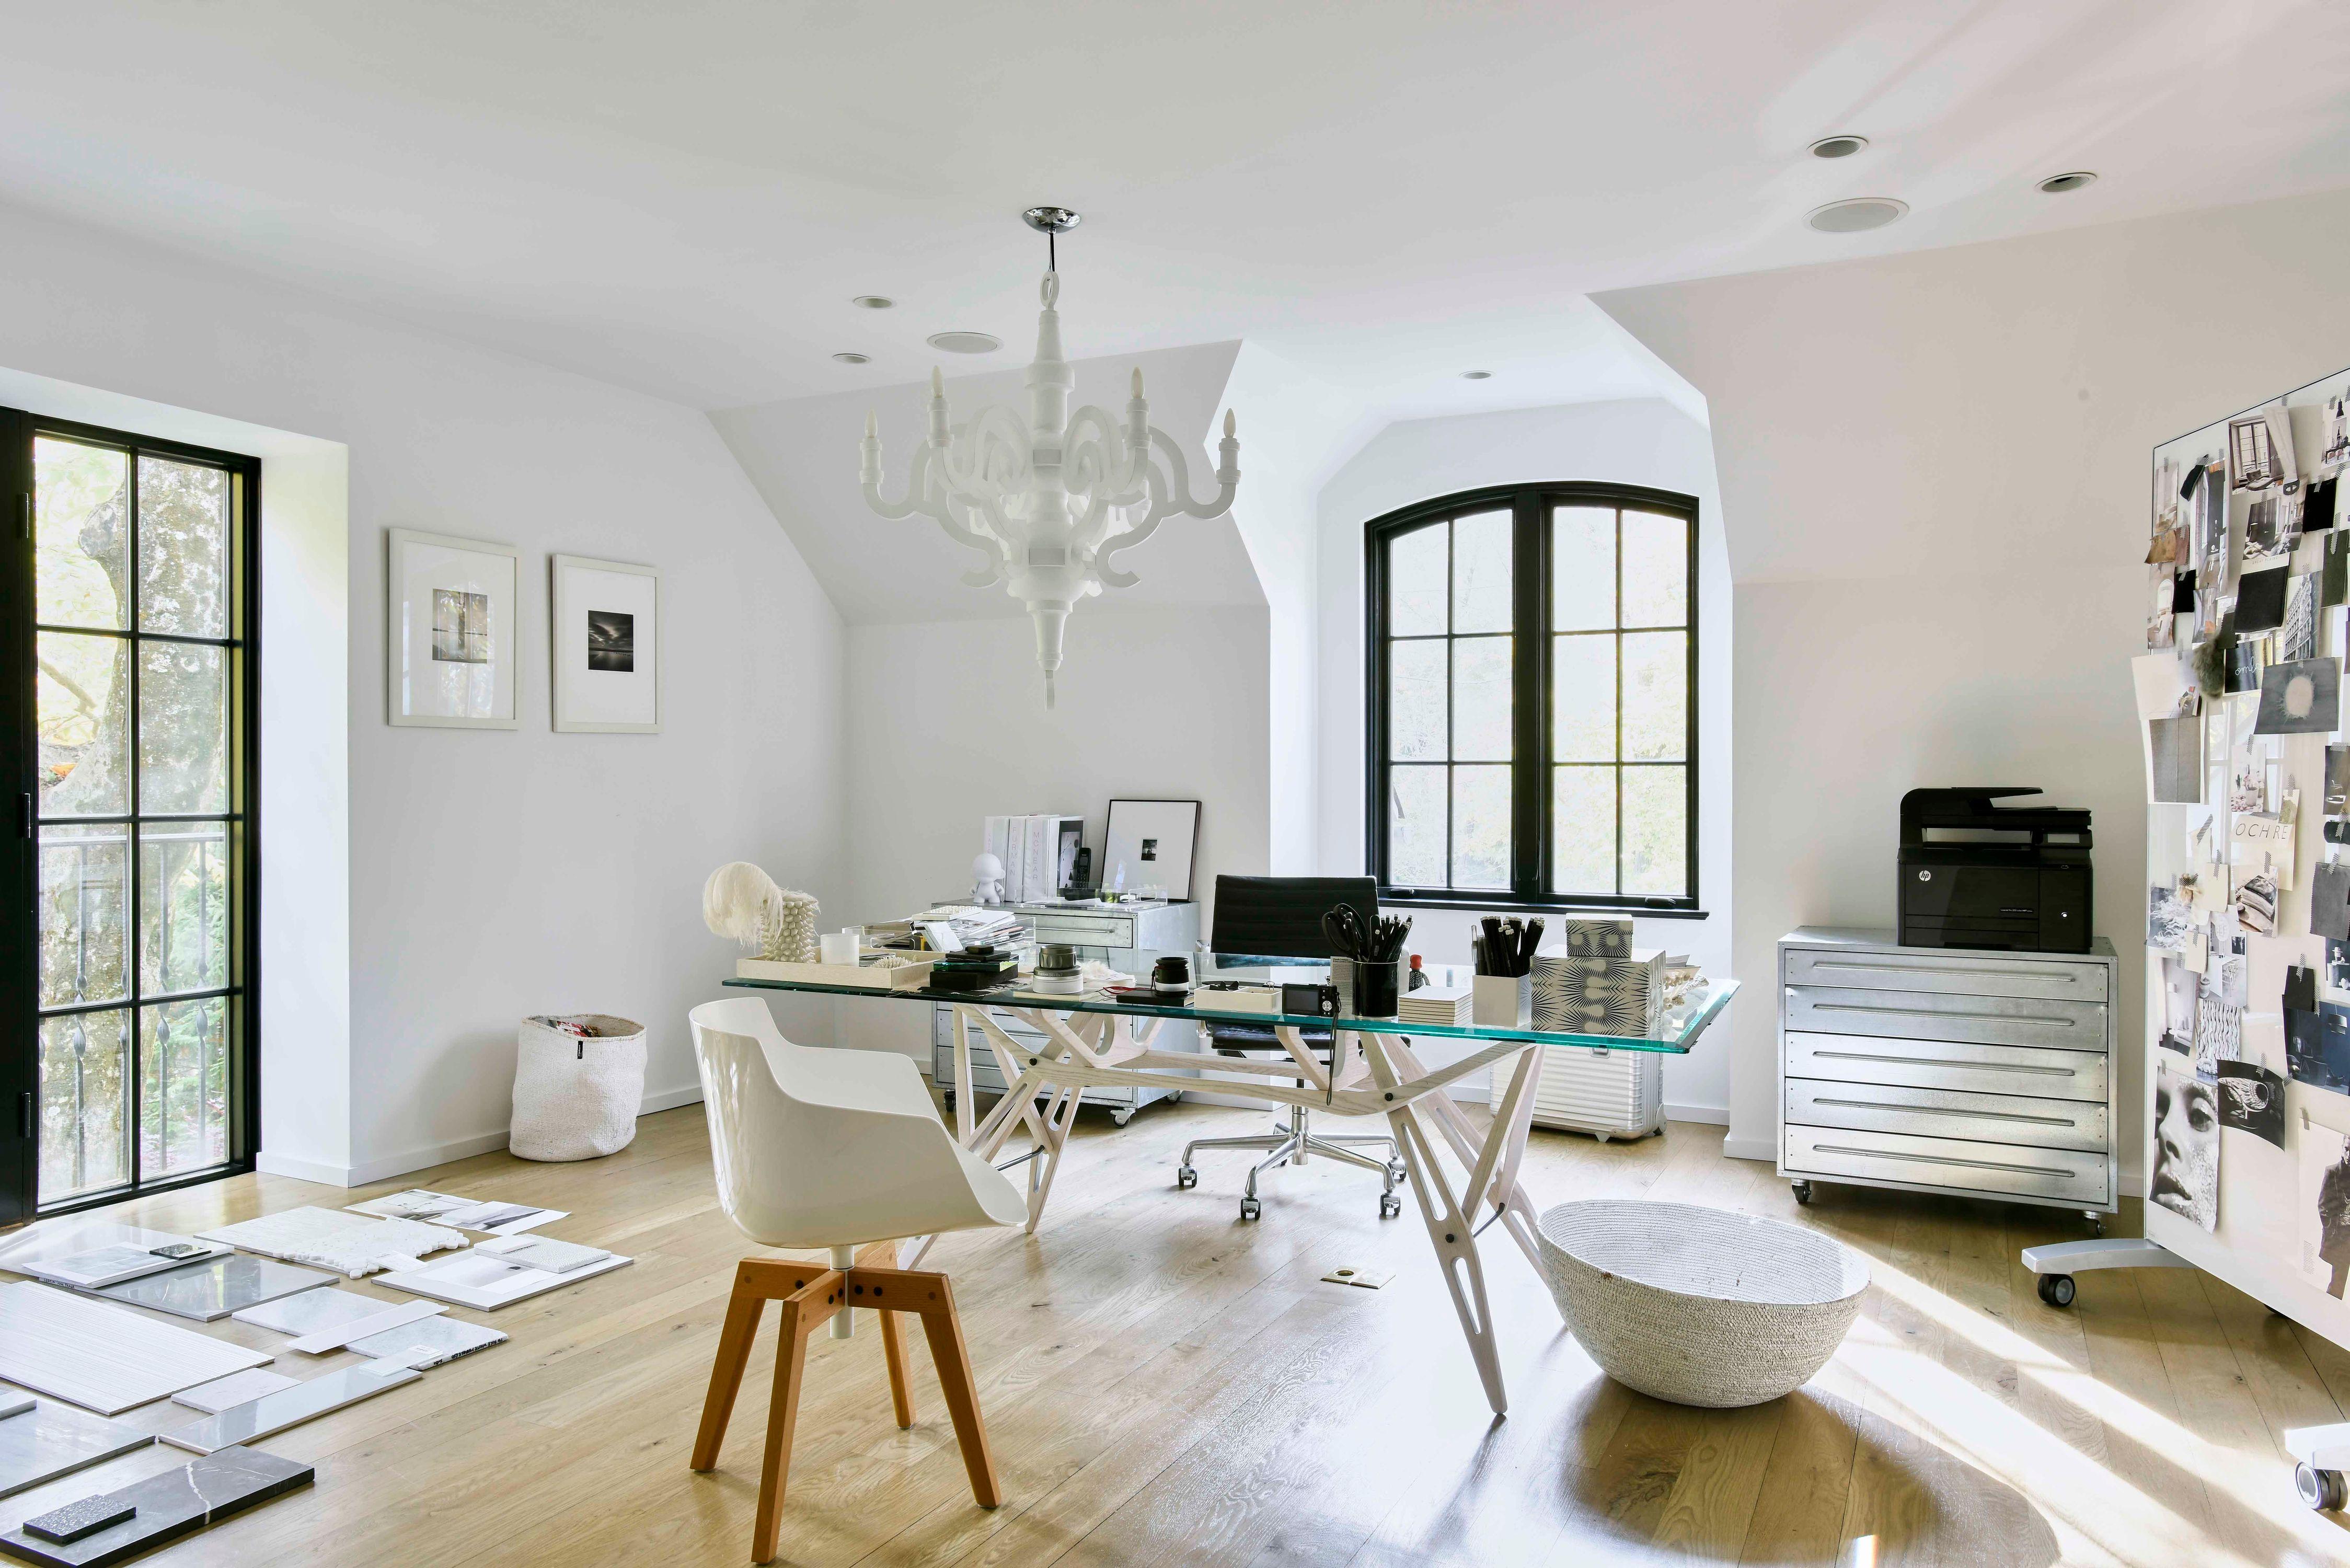 office;modern;white;interiors;nancyhill;nancyhillphoto;nancyhillphotography